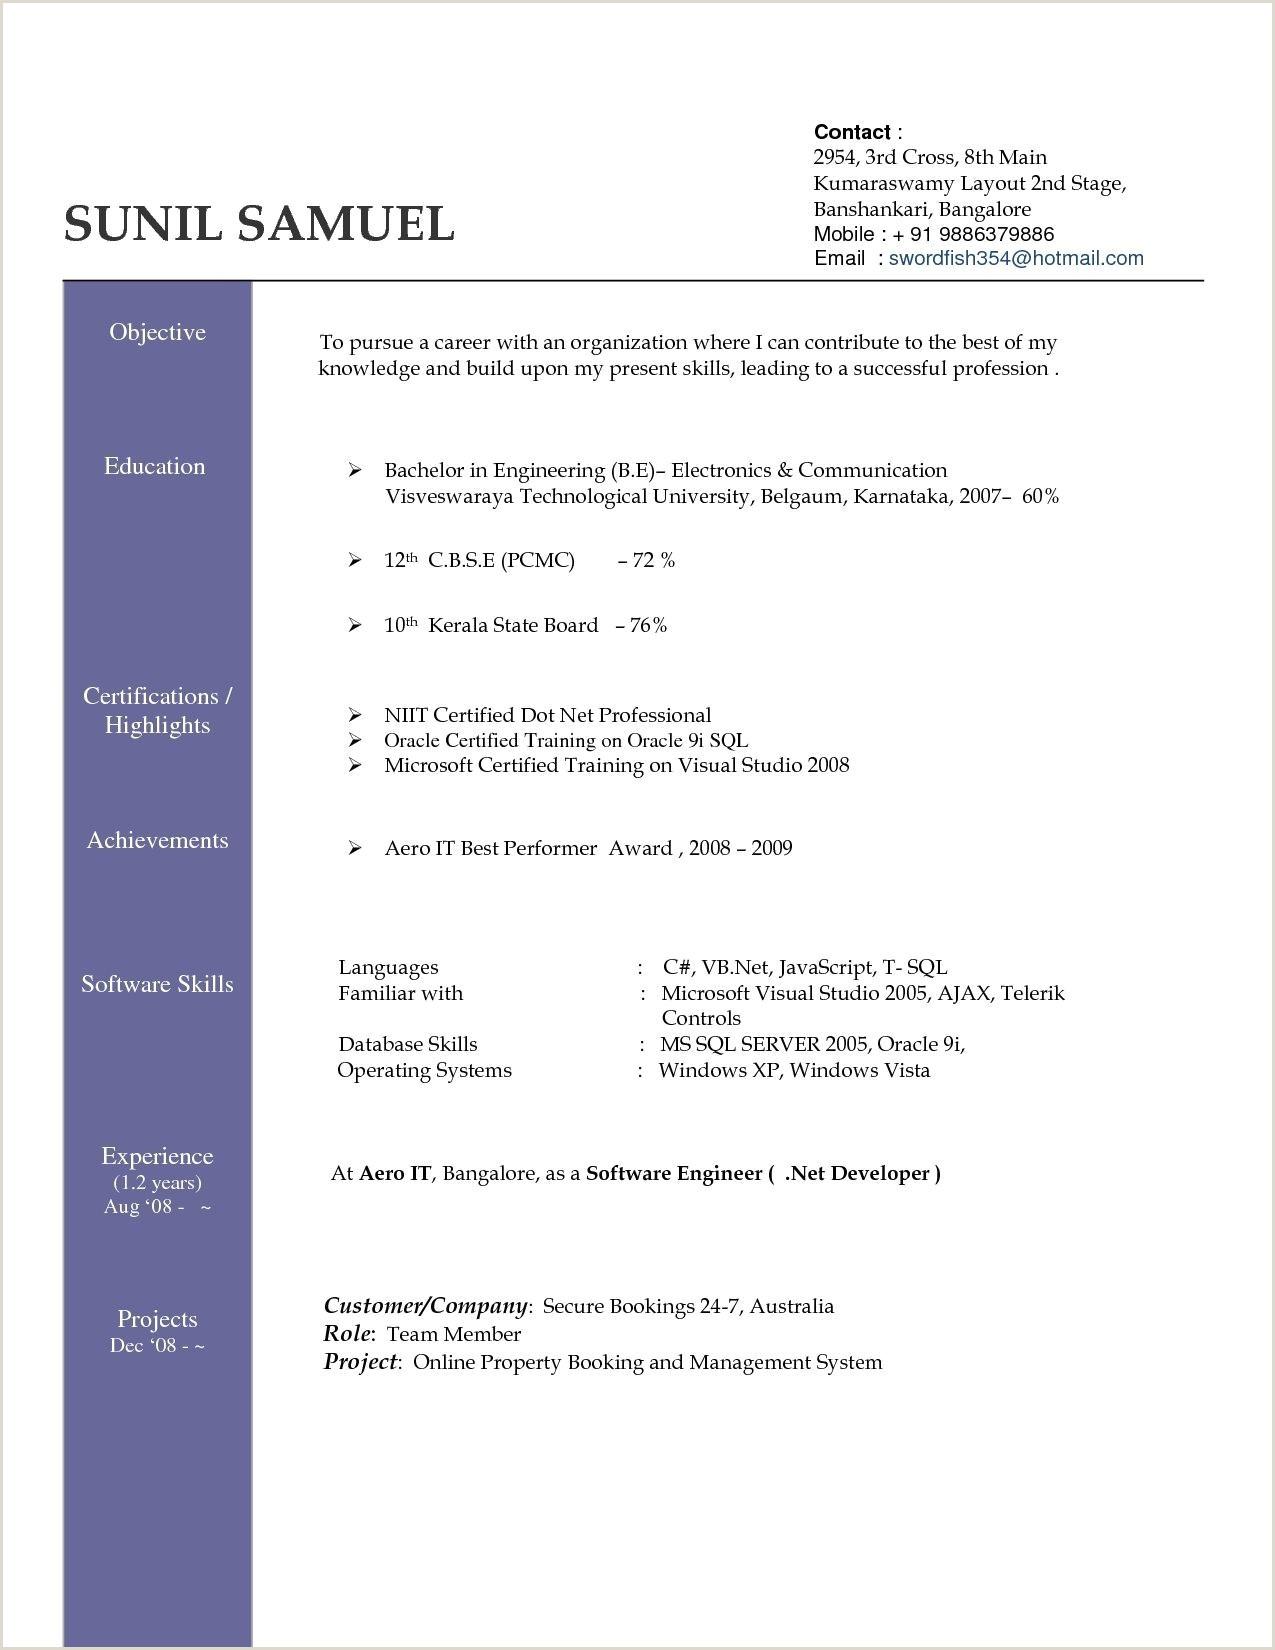 German Cv Template Doc Professional Resume Writers